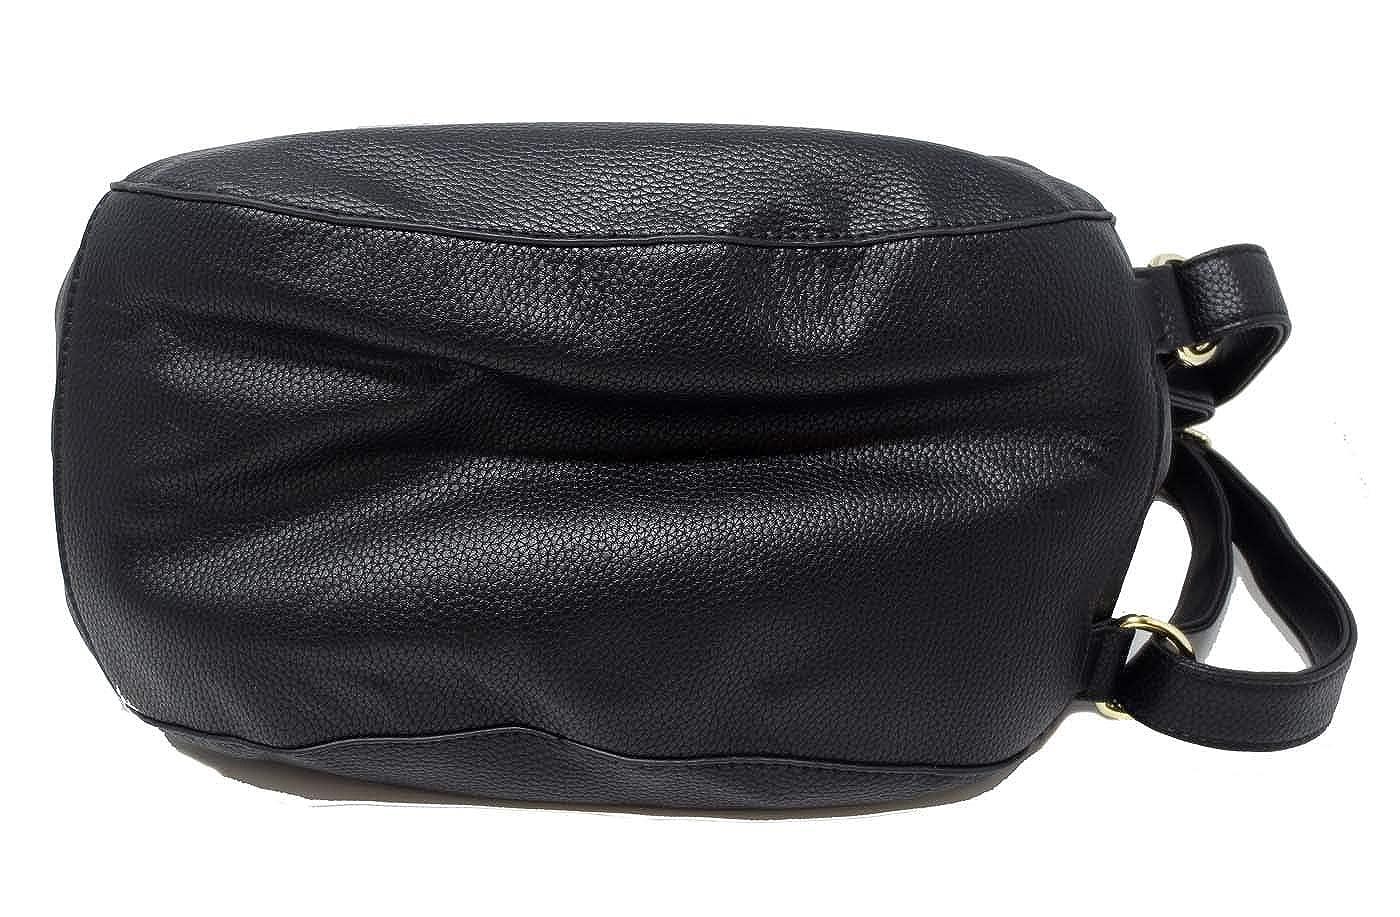 Simply Noelle Vegan Leather Buckle Collection Convertible Shoulder Handbag HB2090